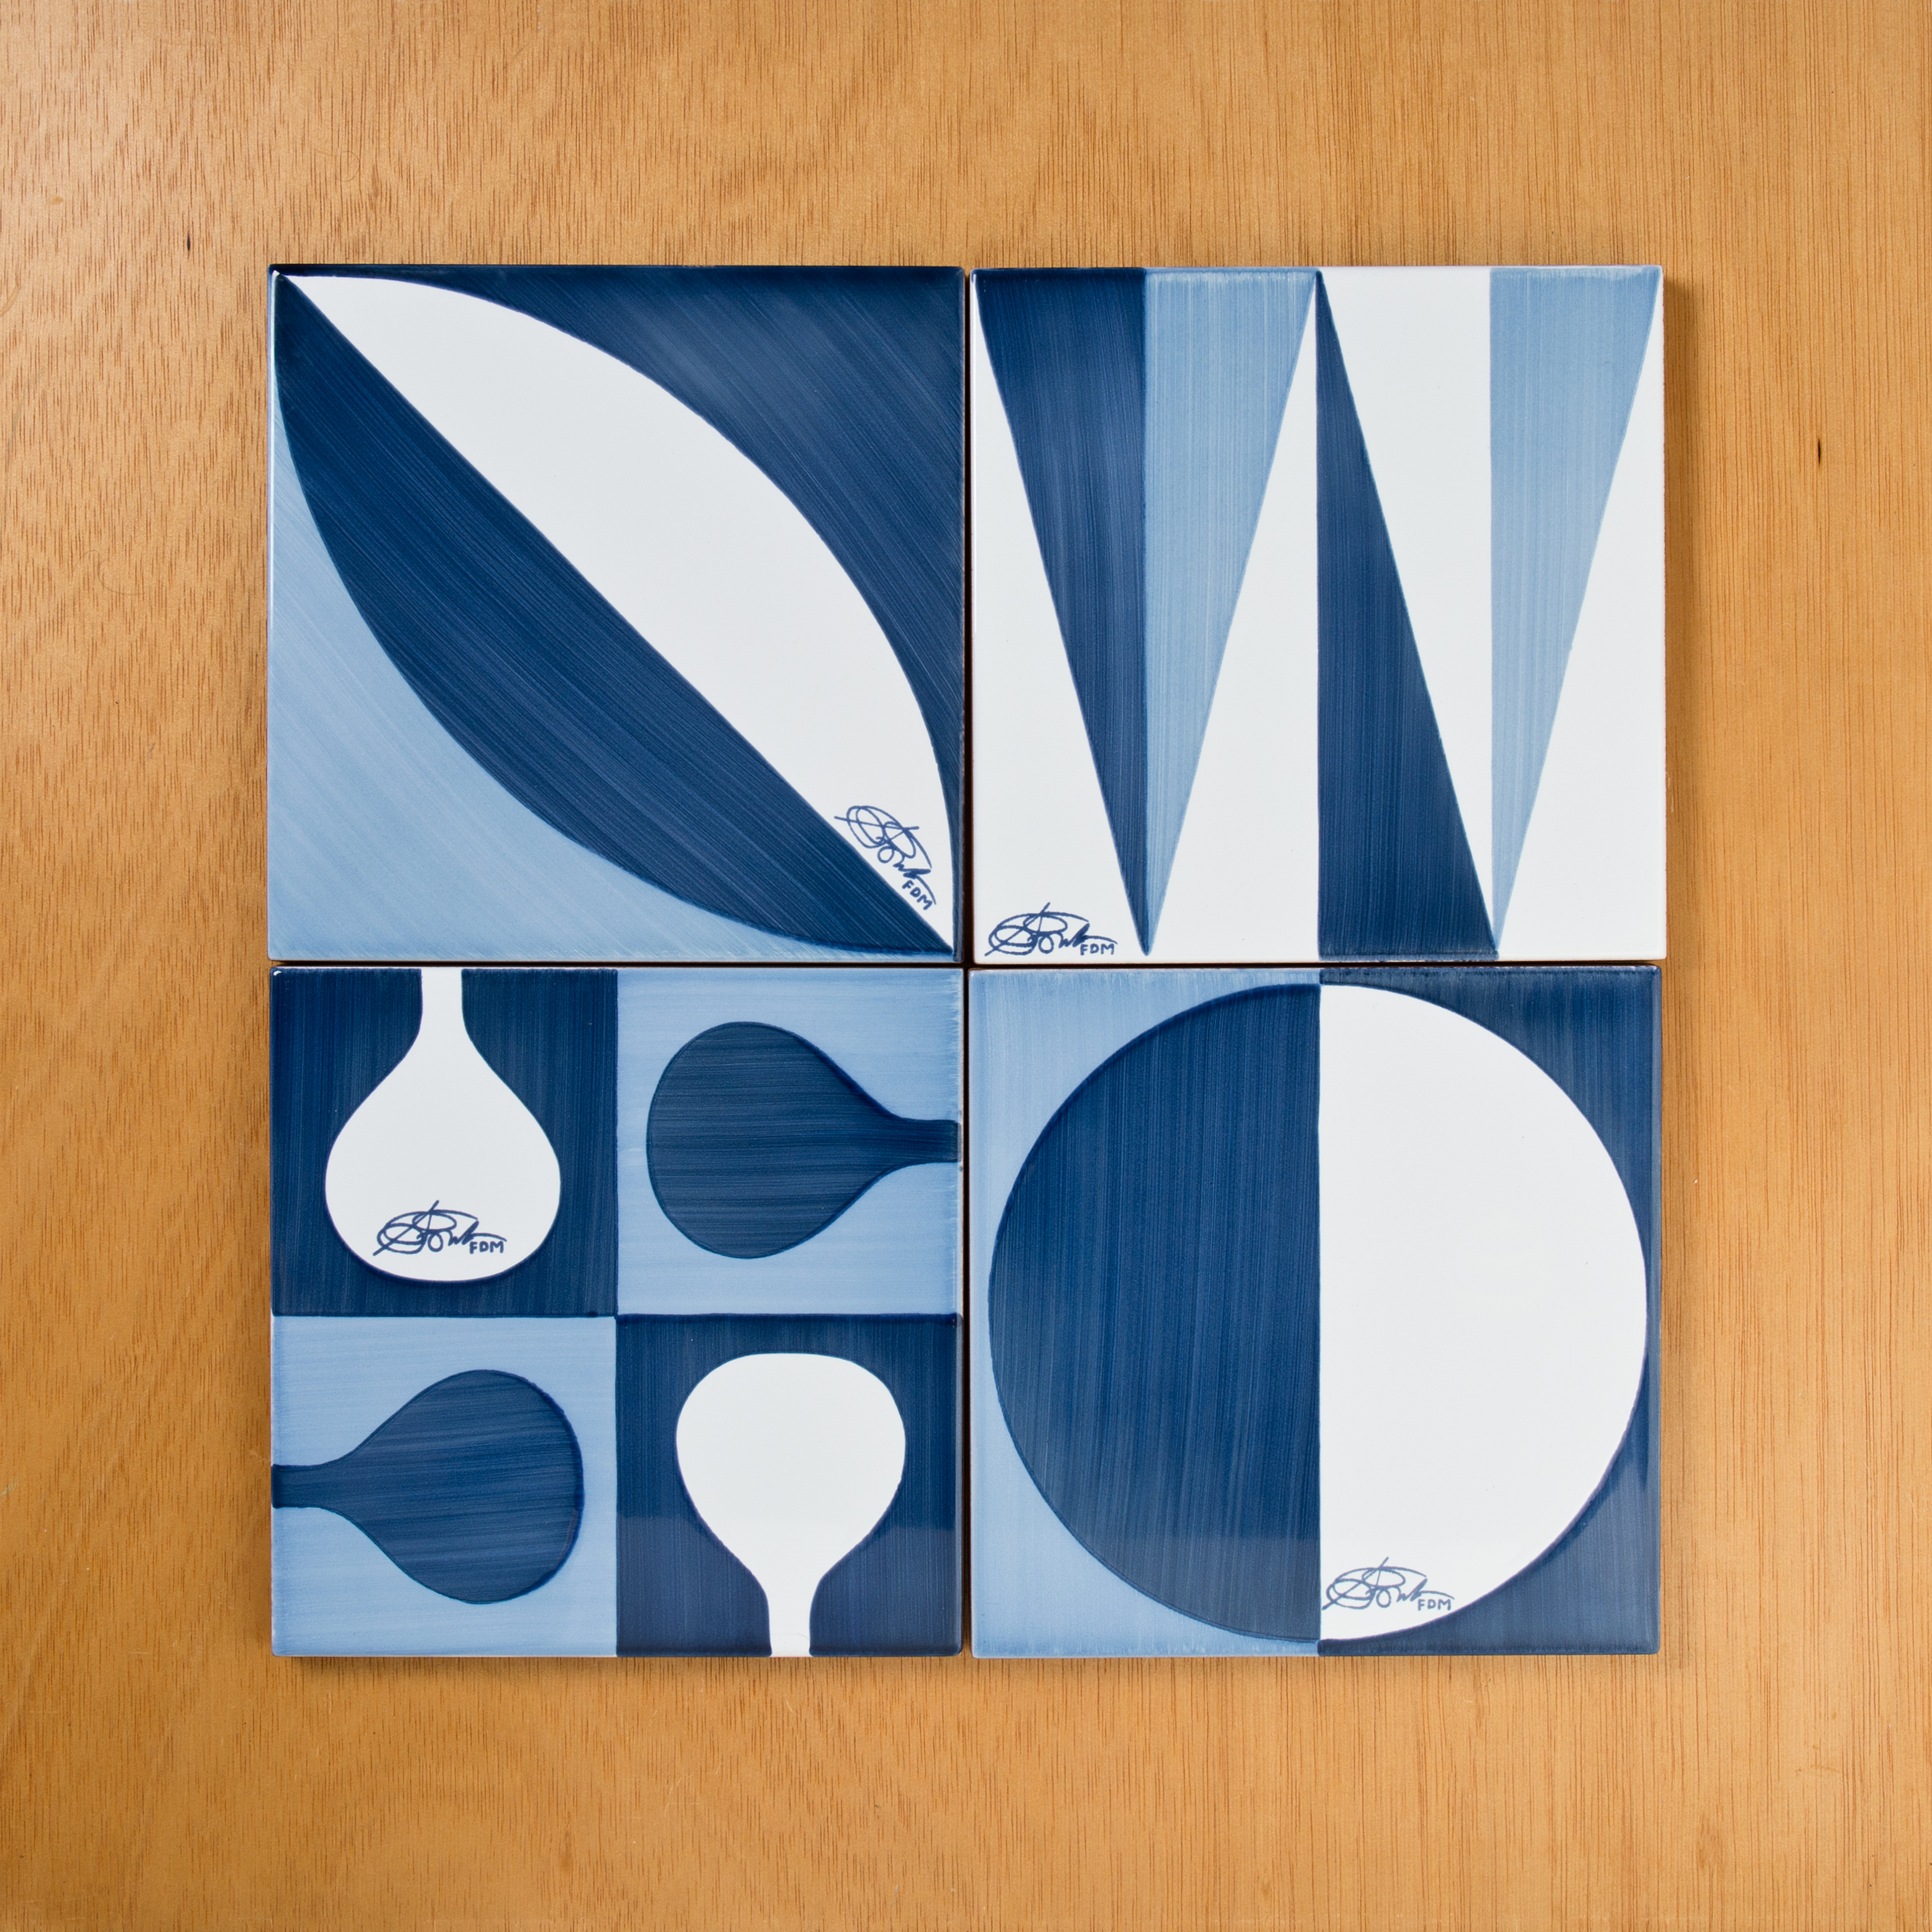 Gio Ponti Ceramic Tiles